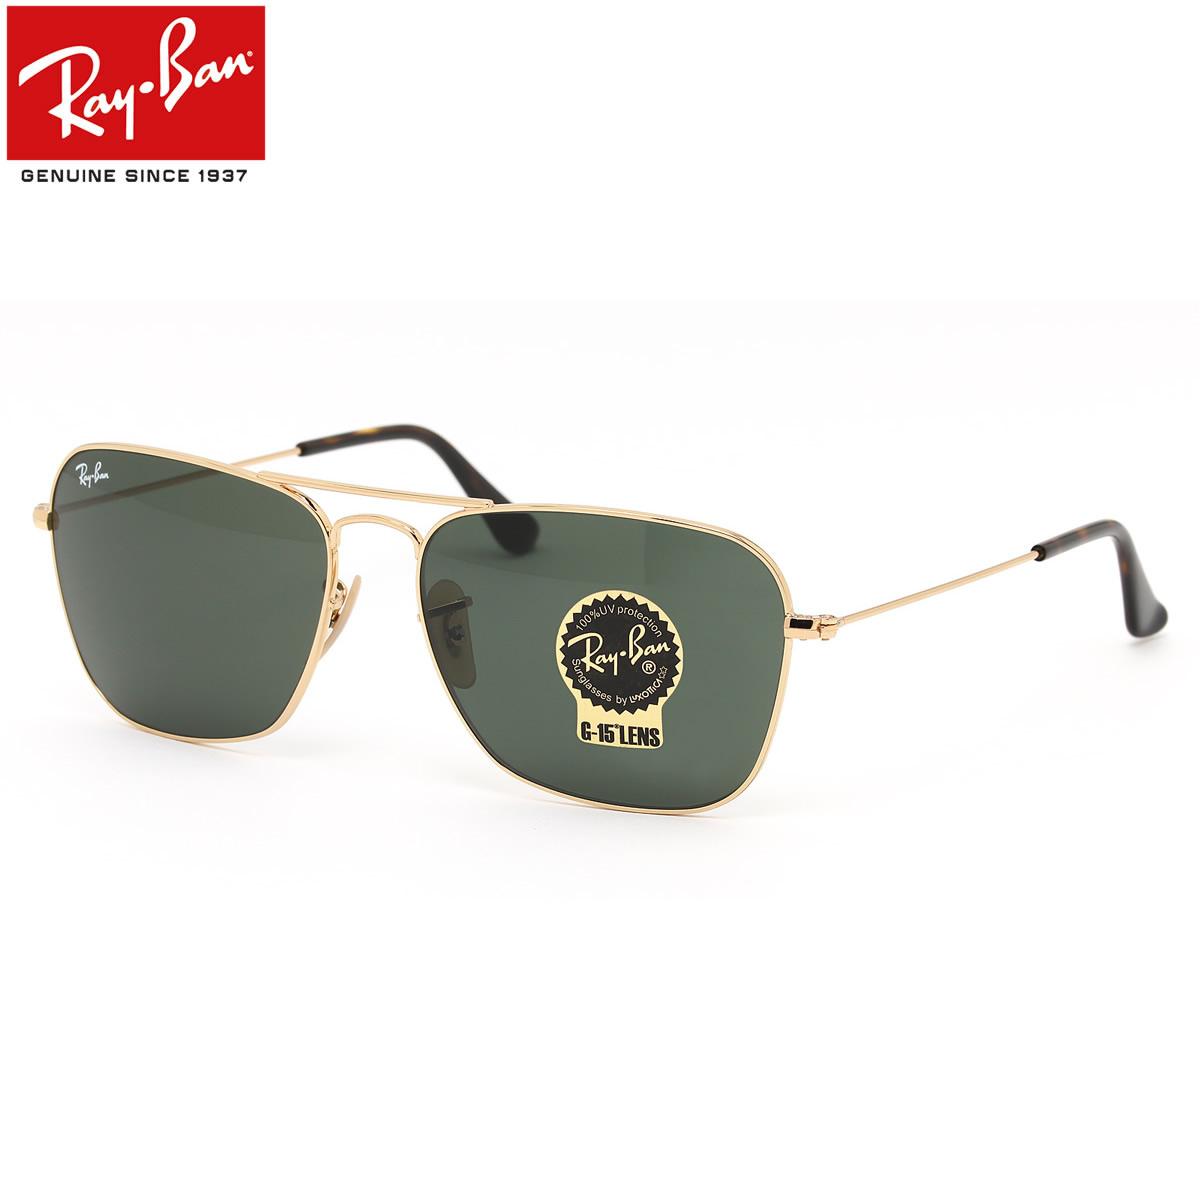 9ff9fd63099 Optical Shop Thats  Ray-Ban Sunglasses RB3136 181 58size CARAVAN ...